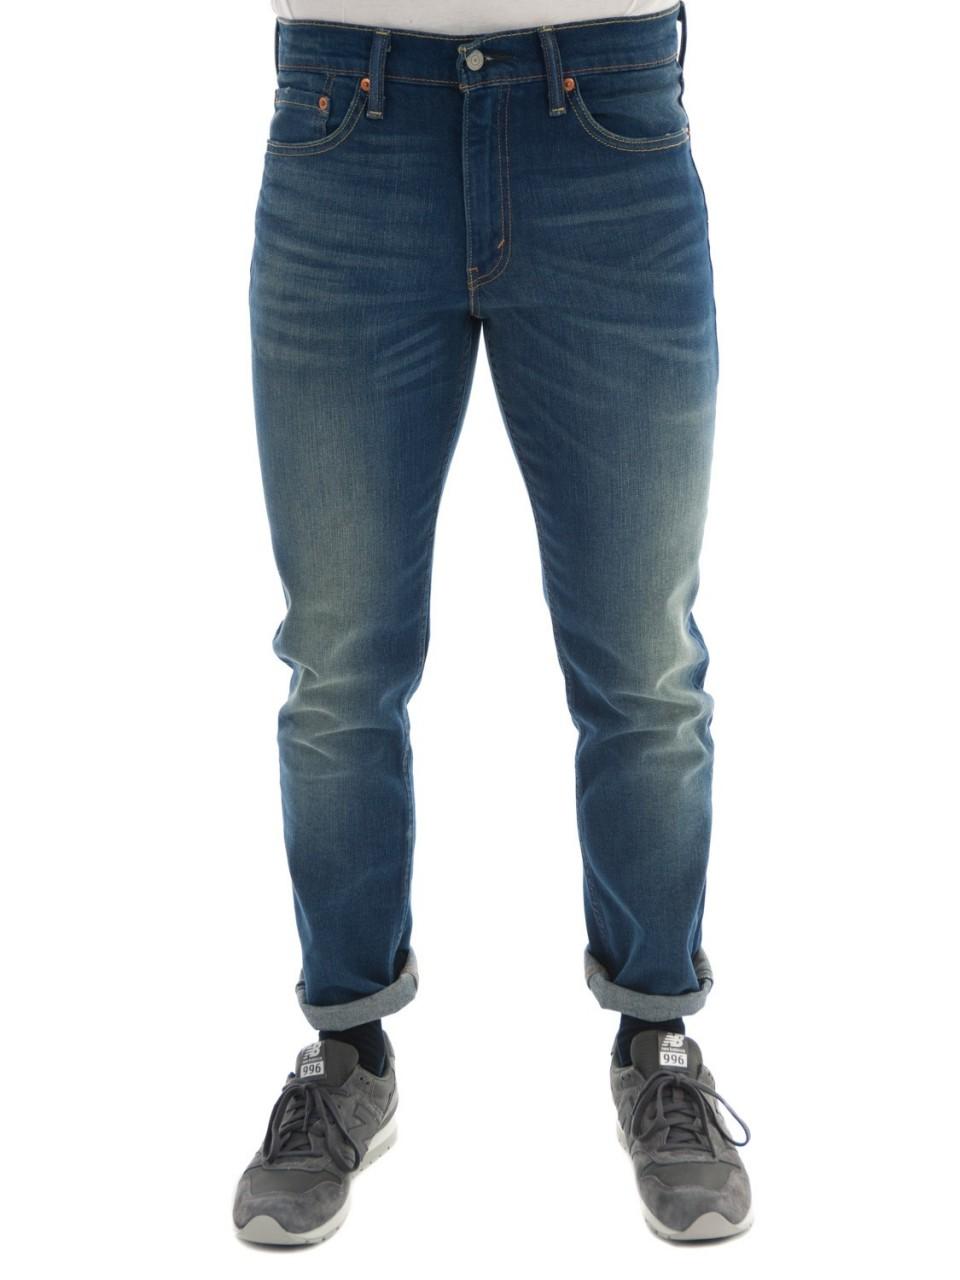 Levi's Uomo Jeans Levi's Homme 511 Torrey Pine L 32 Slim 5111933CH